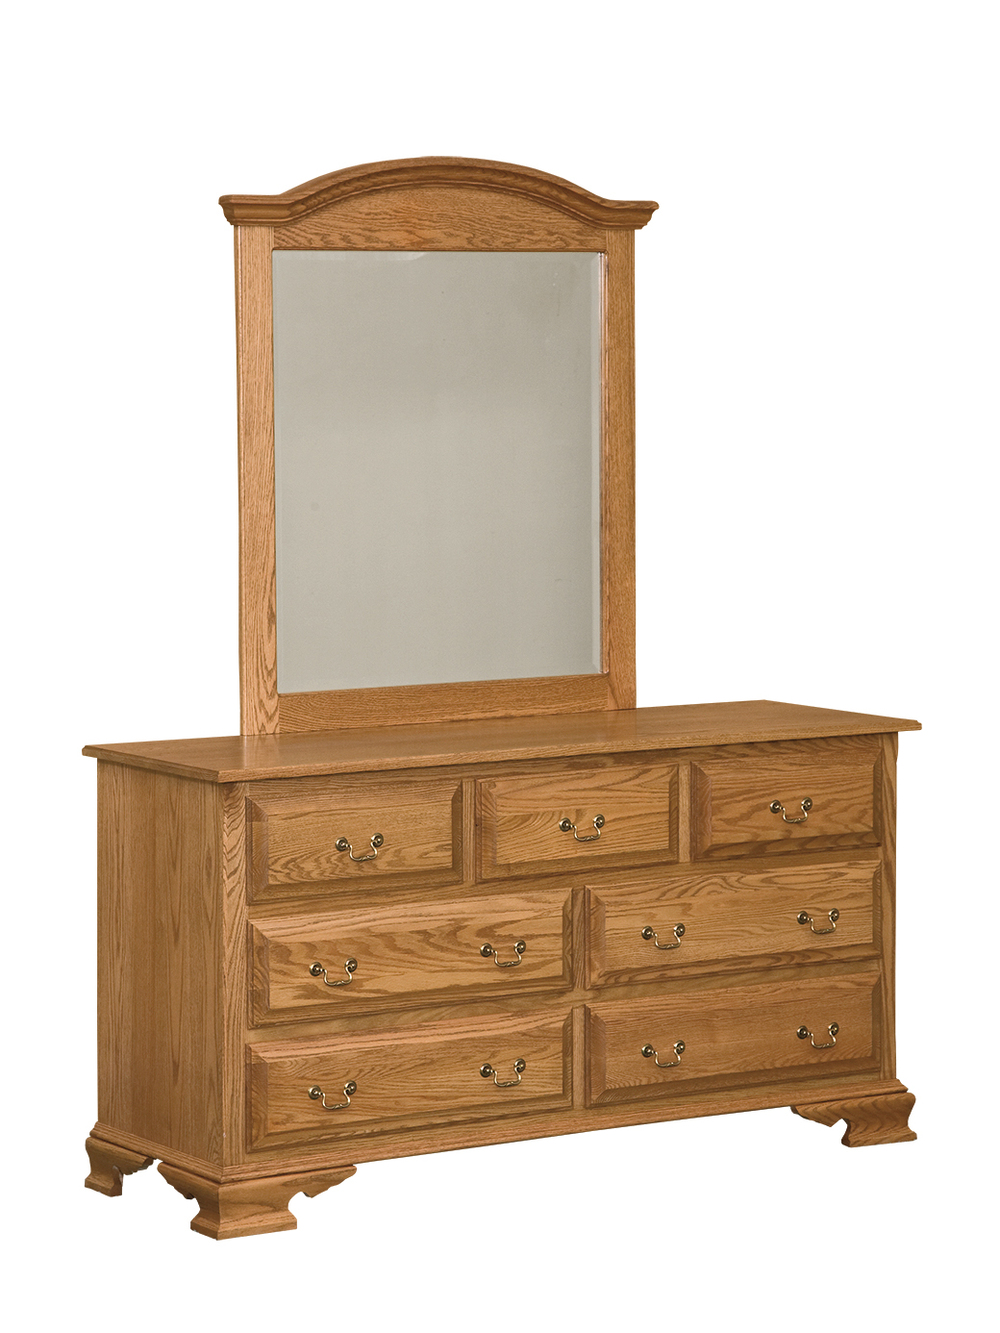 187236-96LA-dresser+798-mirror.jpg